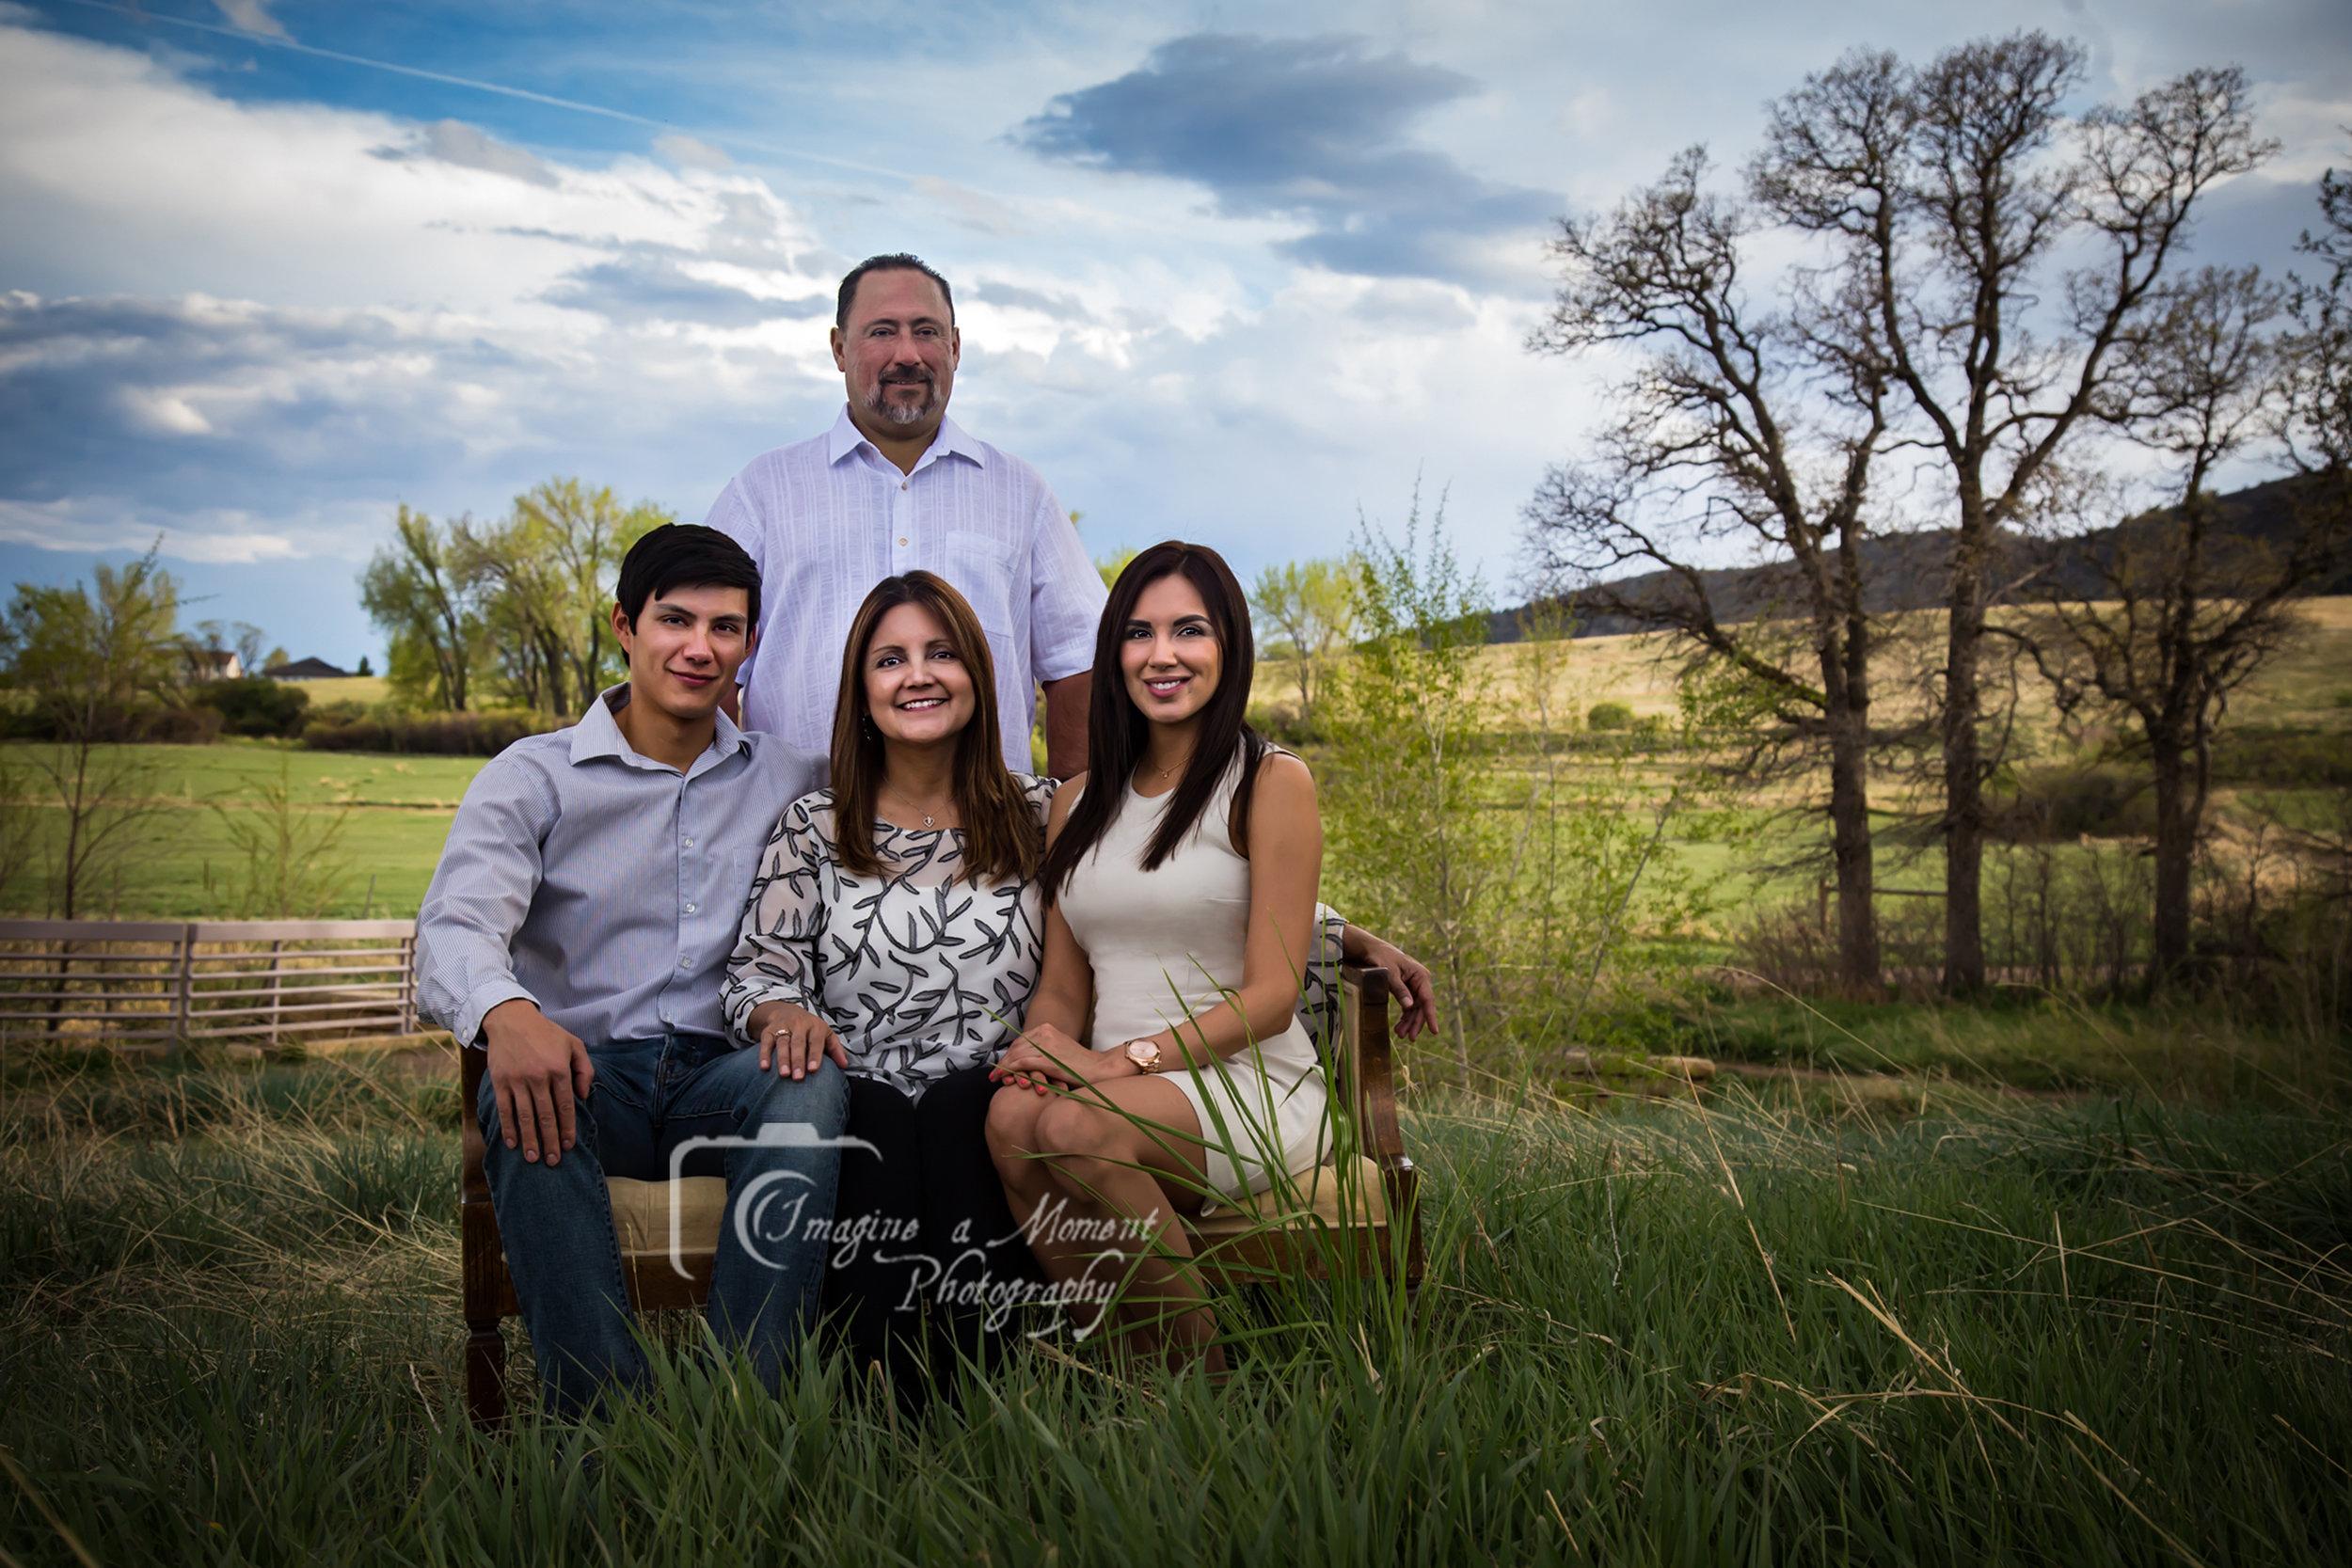 Priscilla Sandoval Family 20171 WM.jpg